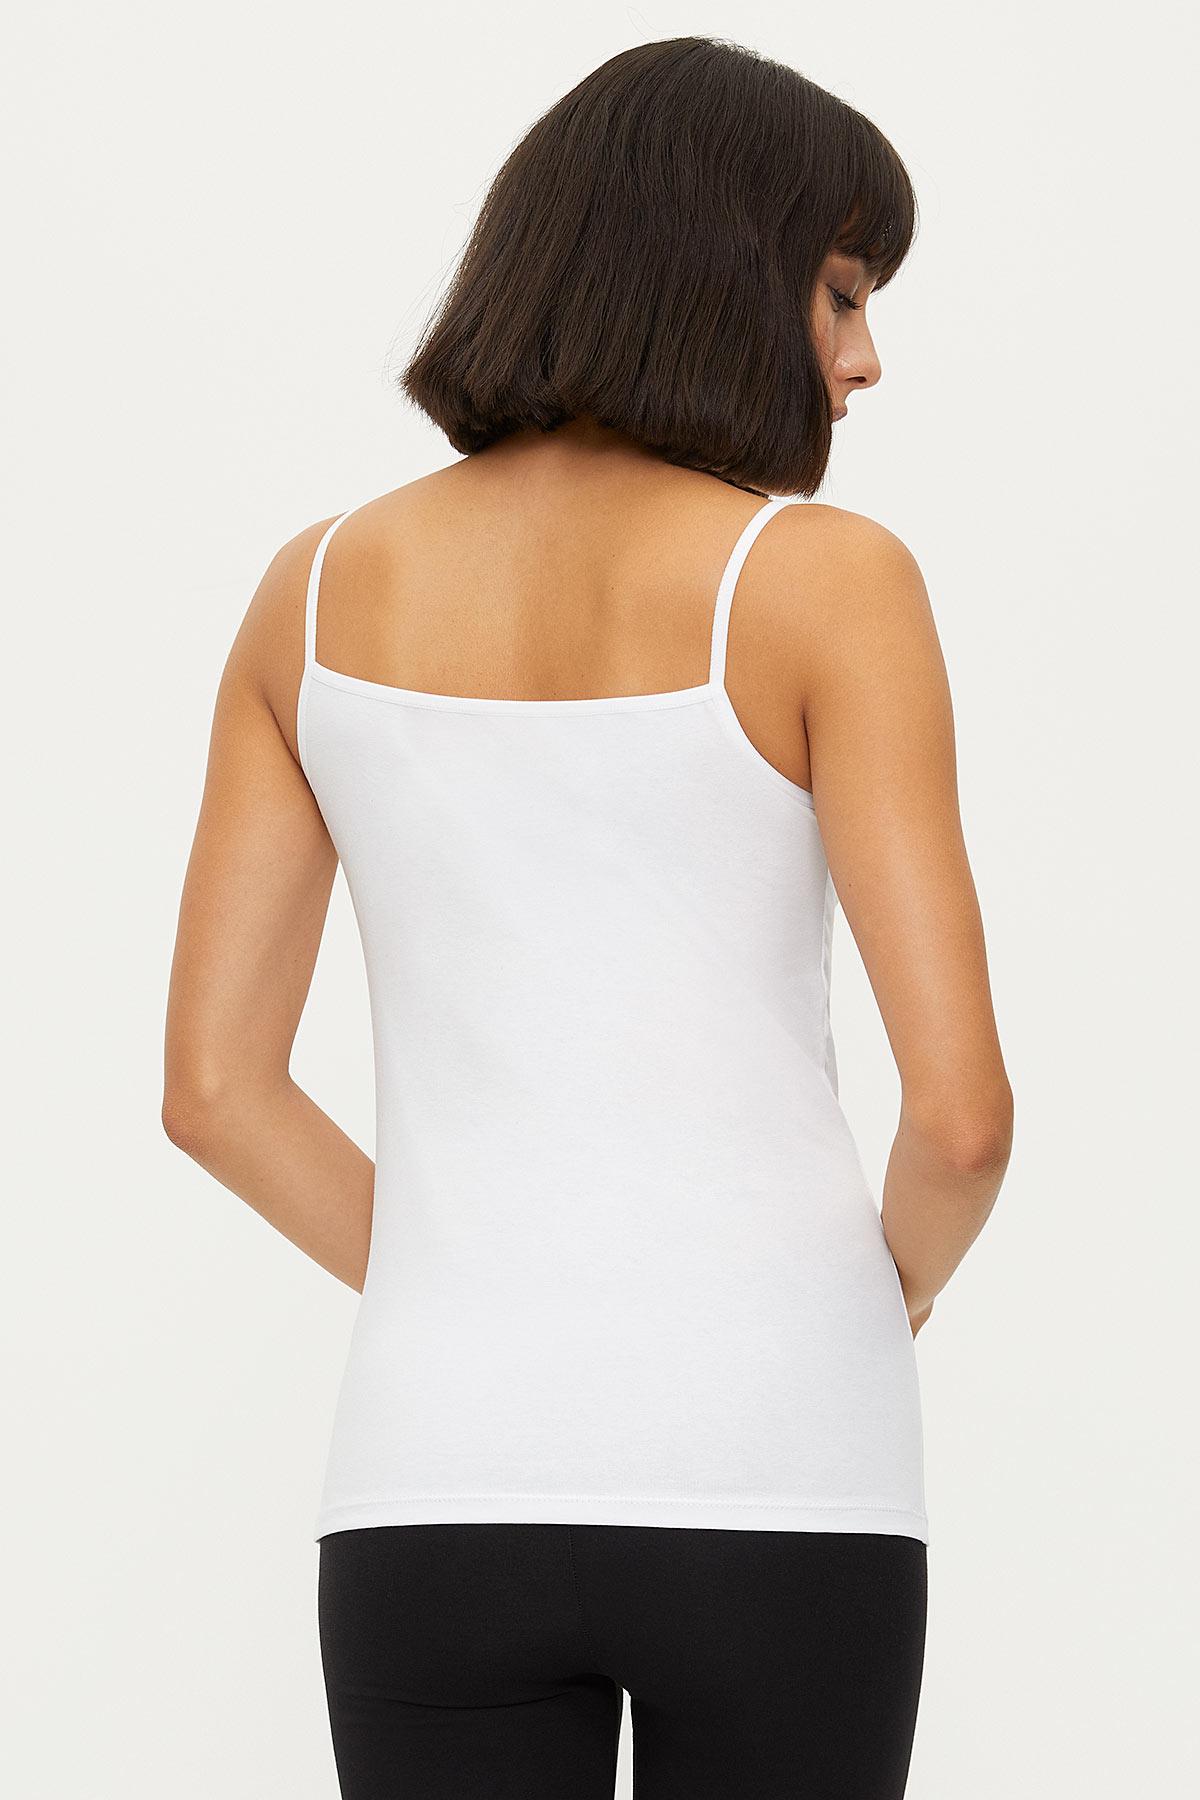 1275 Lycra Strappy Lace Women's Undershirt